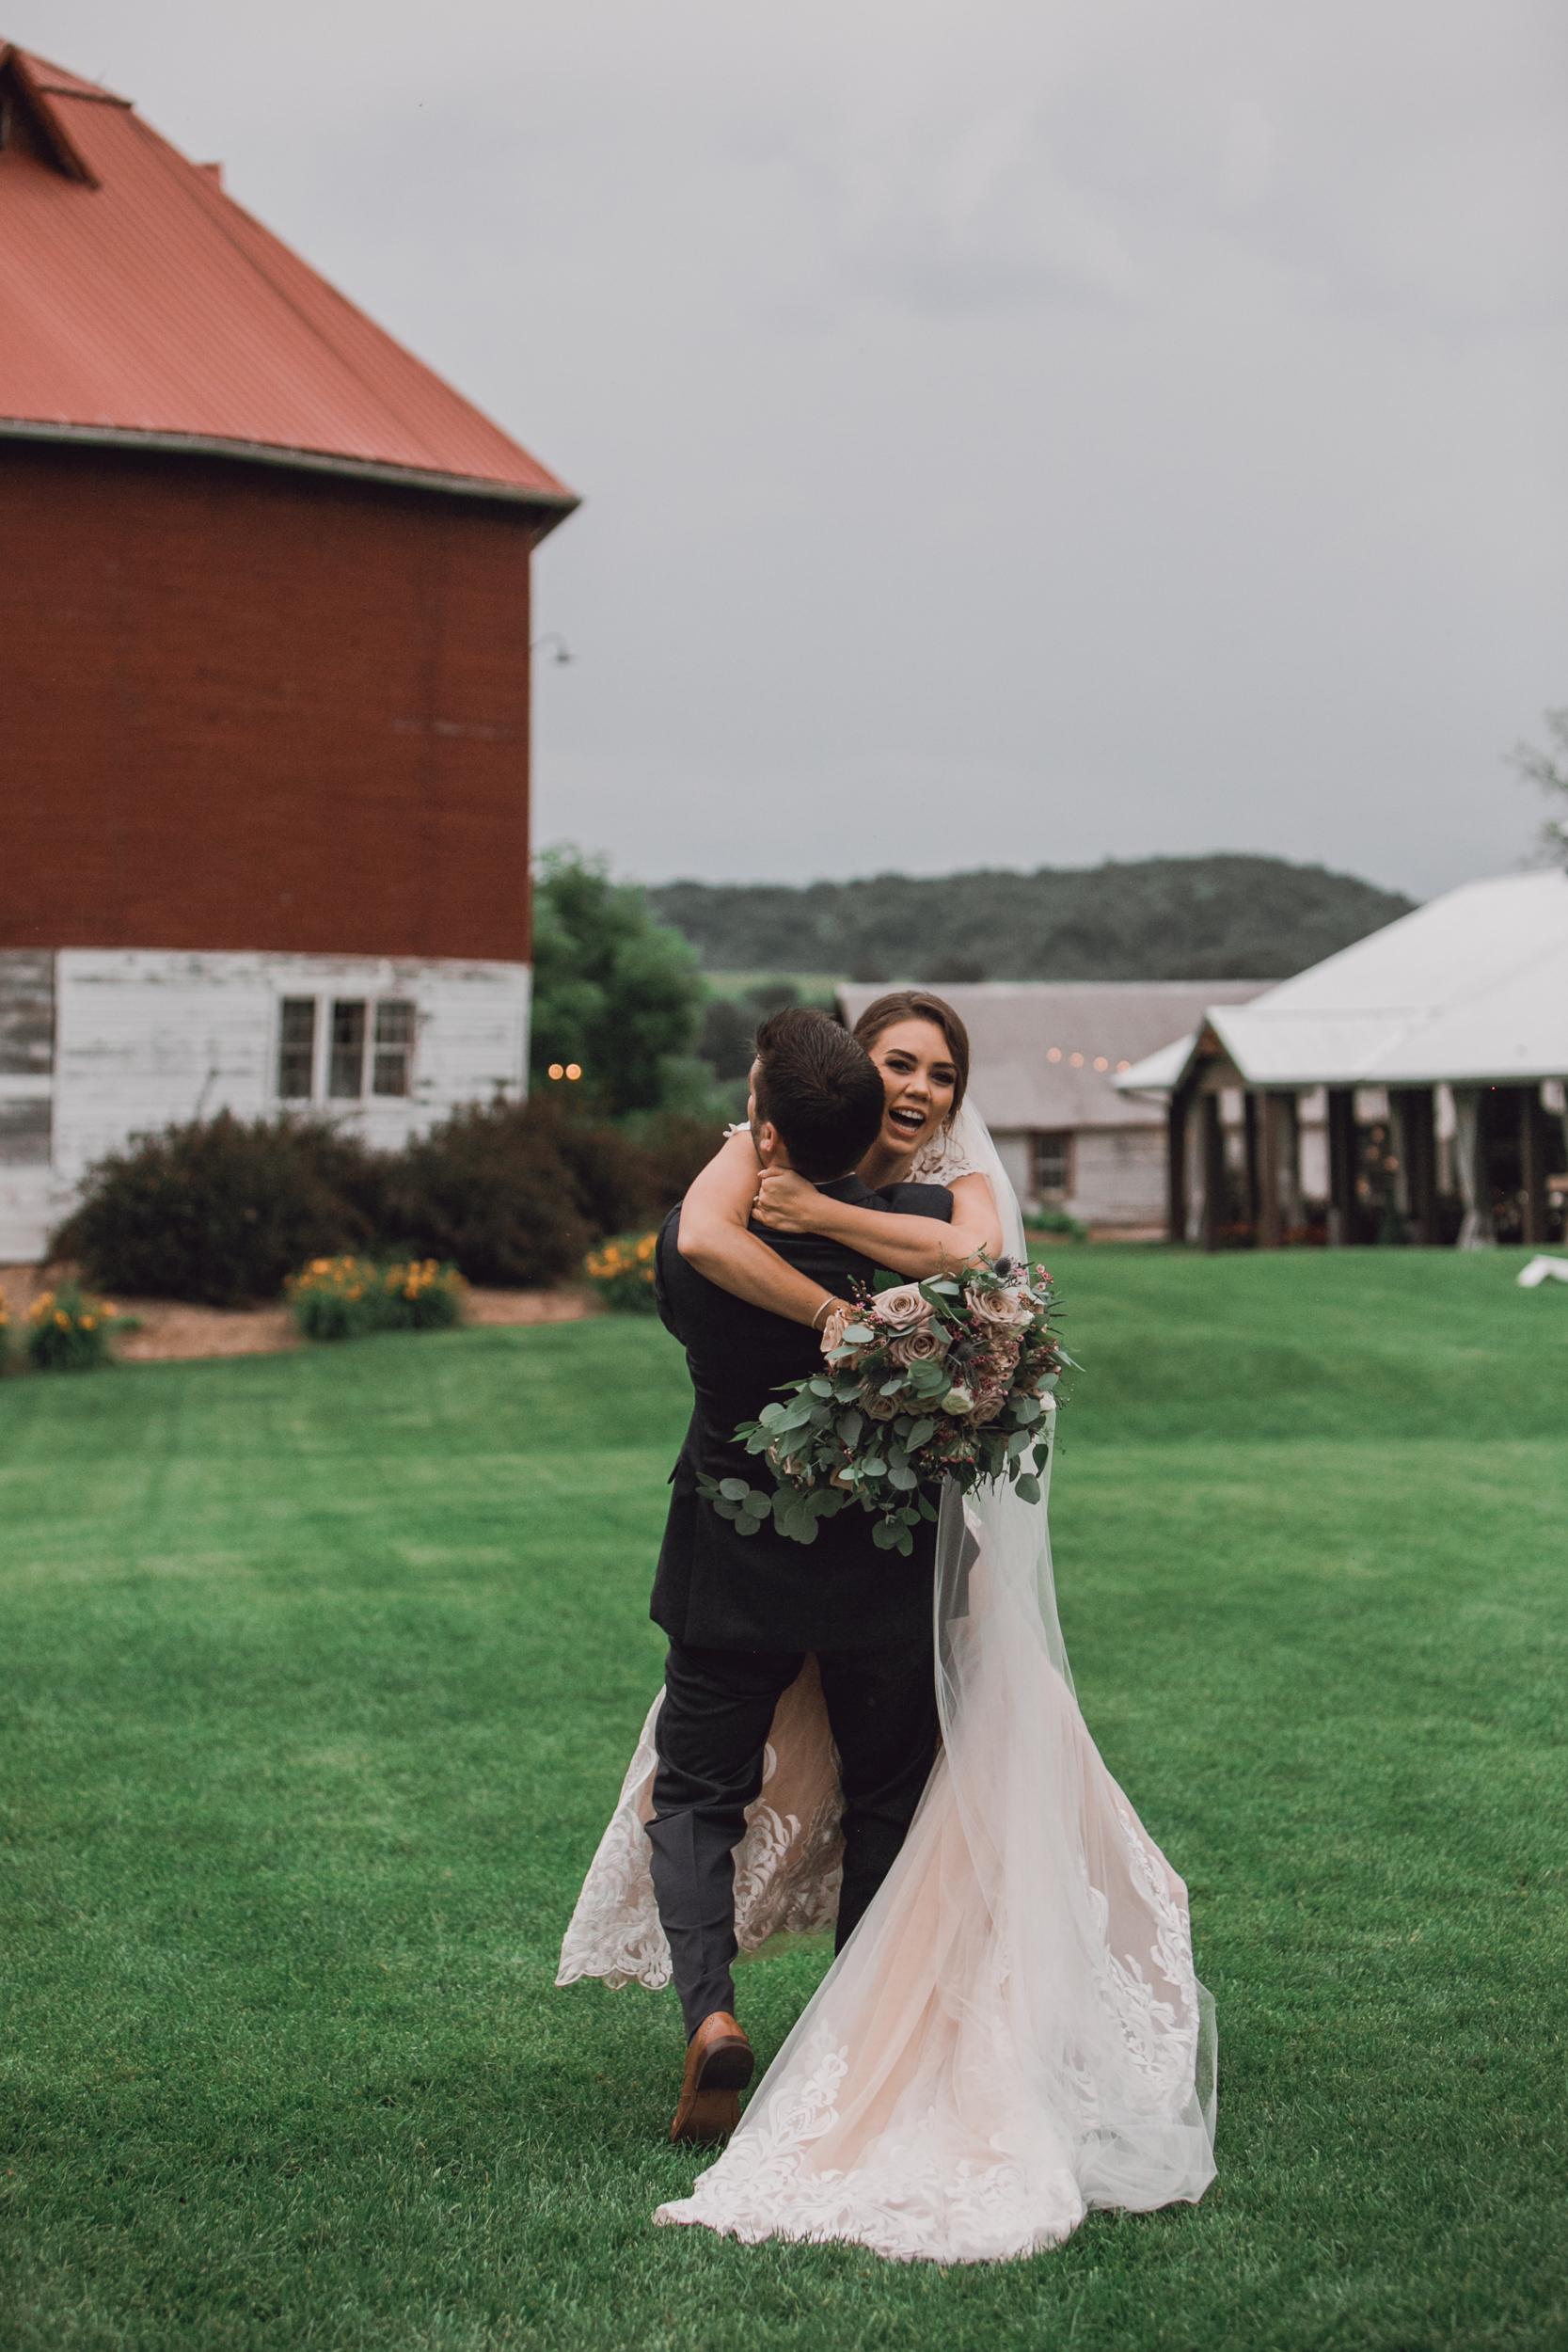 Hidden-meadow-barn-wedding-dark-moody-14.jpg